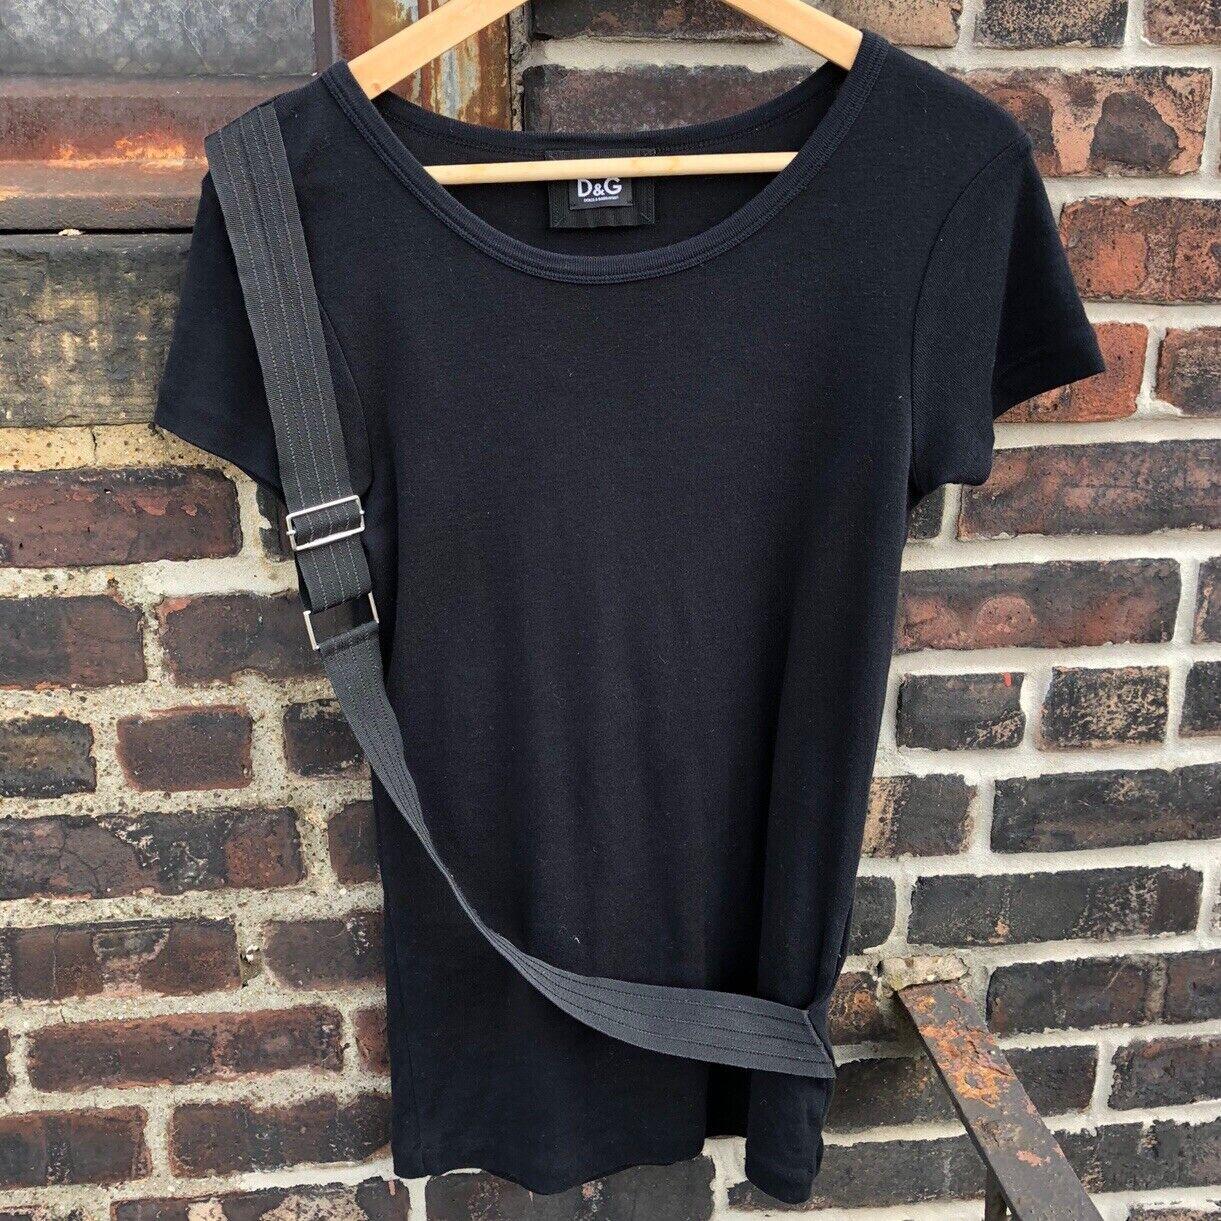 Dolce & Gabbana Black Parachute Strap Knit Cotton… - image 2